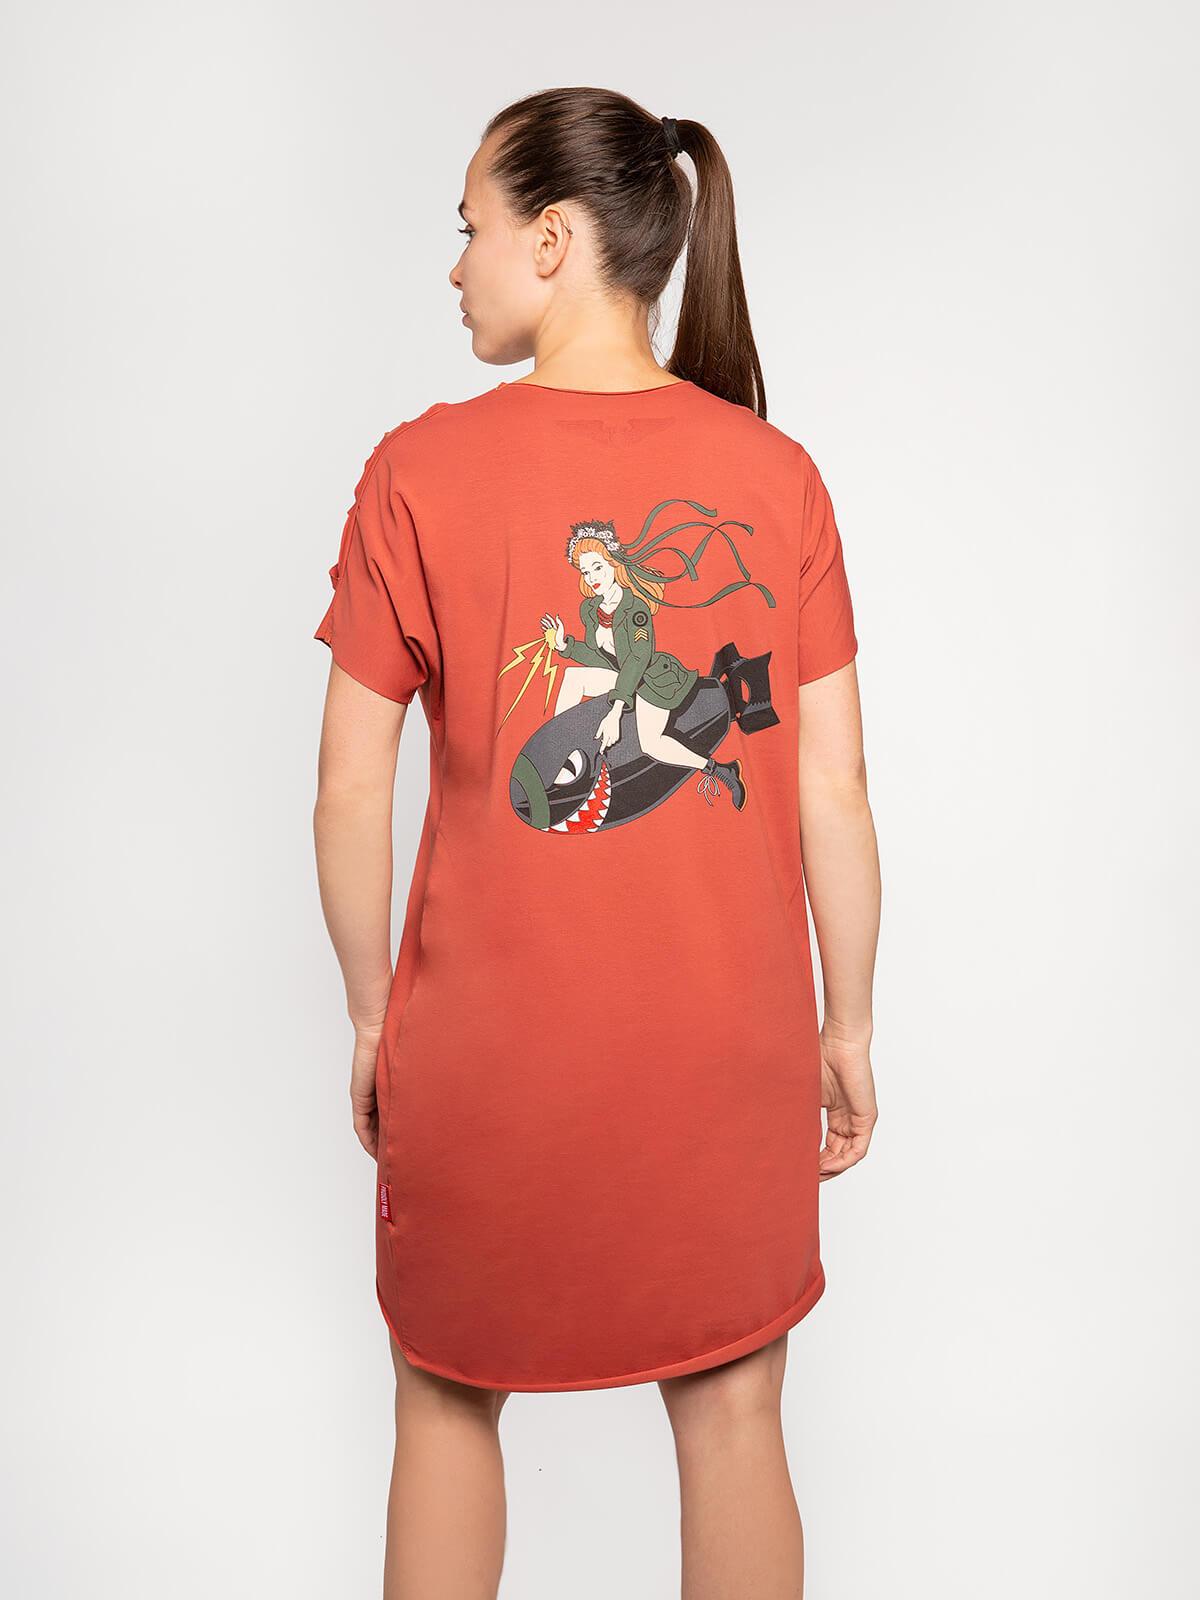 Women's Dress Sophia. Color terracotta.  Technique of prints applied: silkscreen printing.